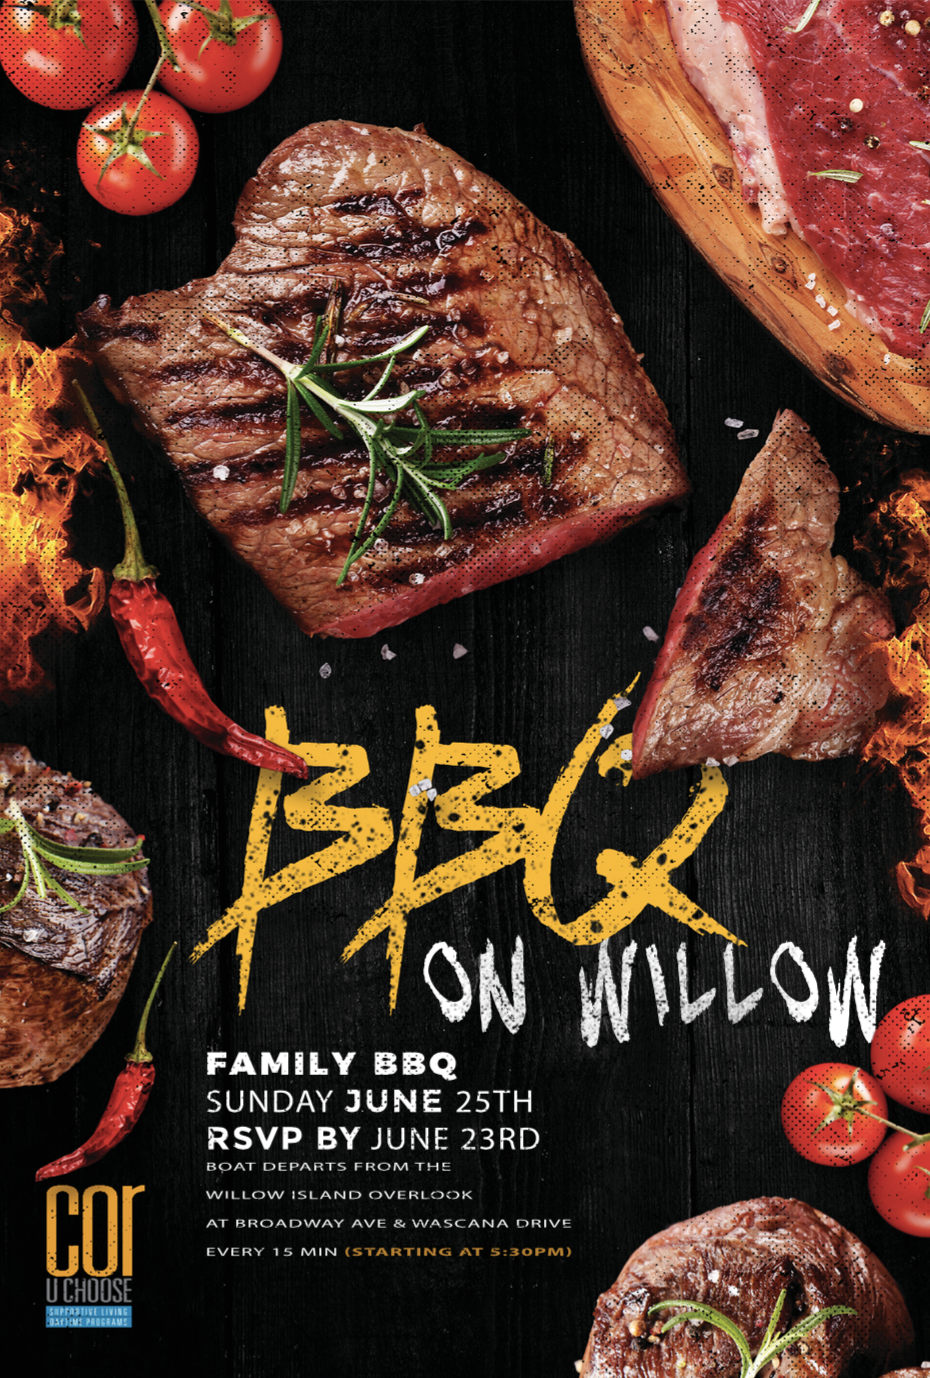 Family BBQ 2017